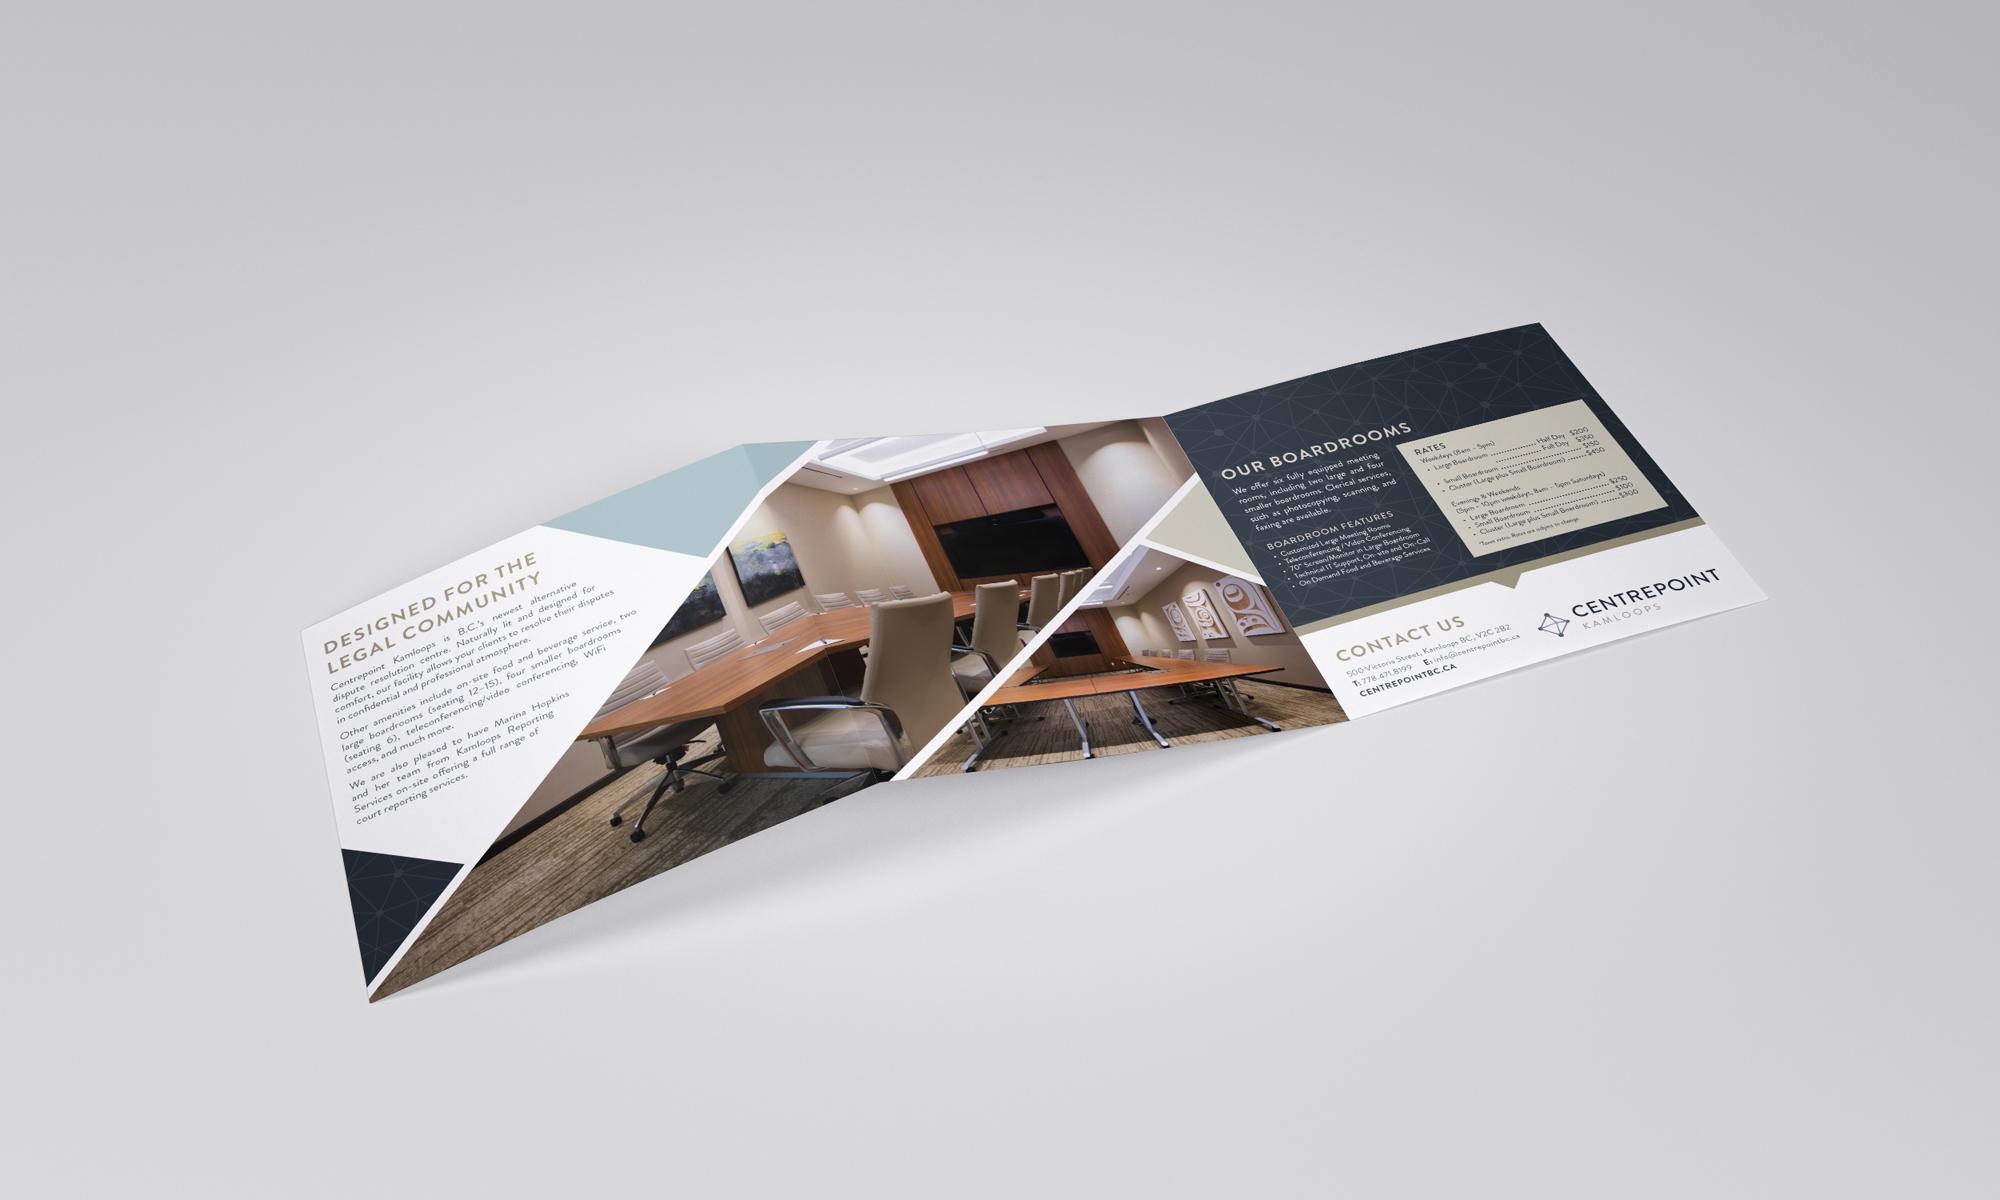 centrepoint_brochure_inside